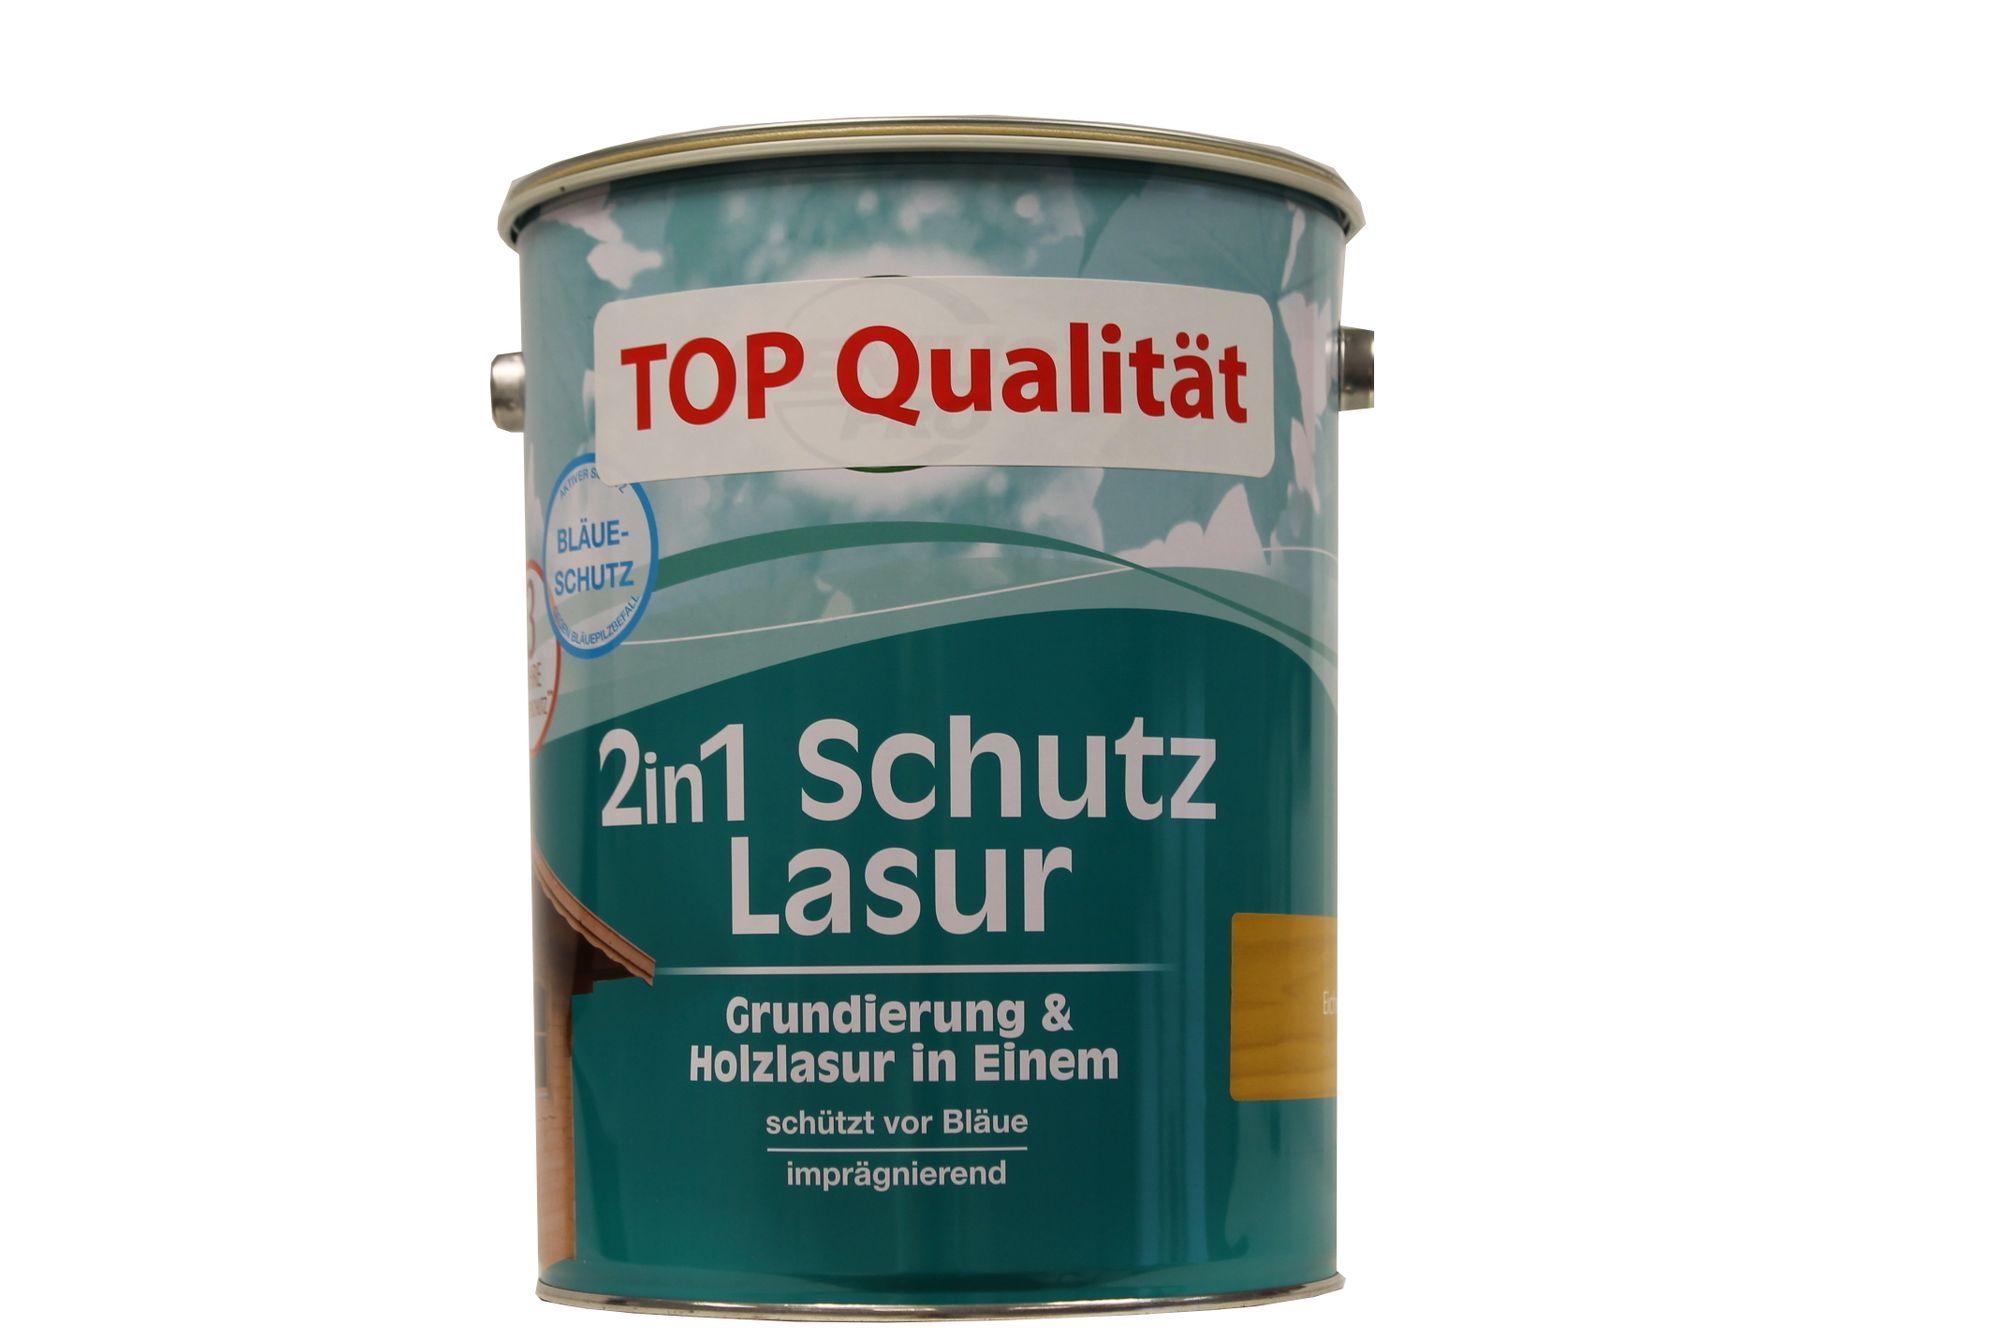 Genius PRO 2in1 Holzlasur Grundierung&Holzlasur Eiche 5 L